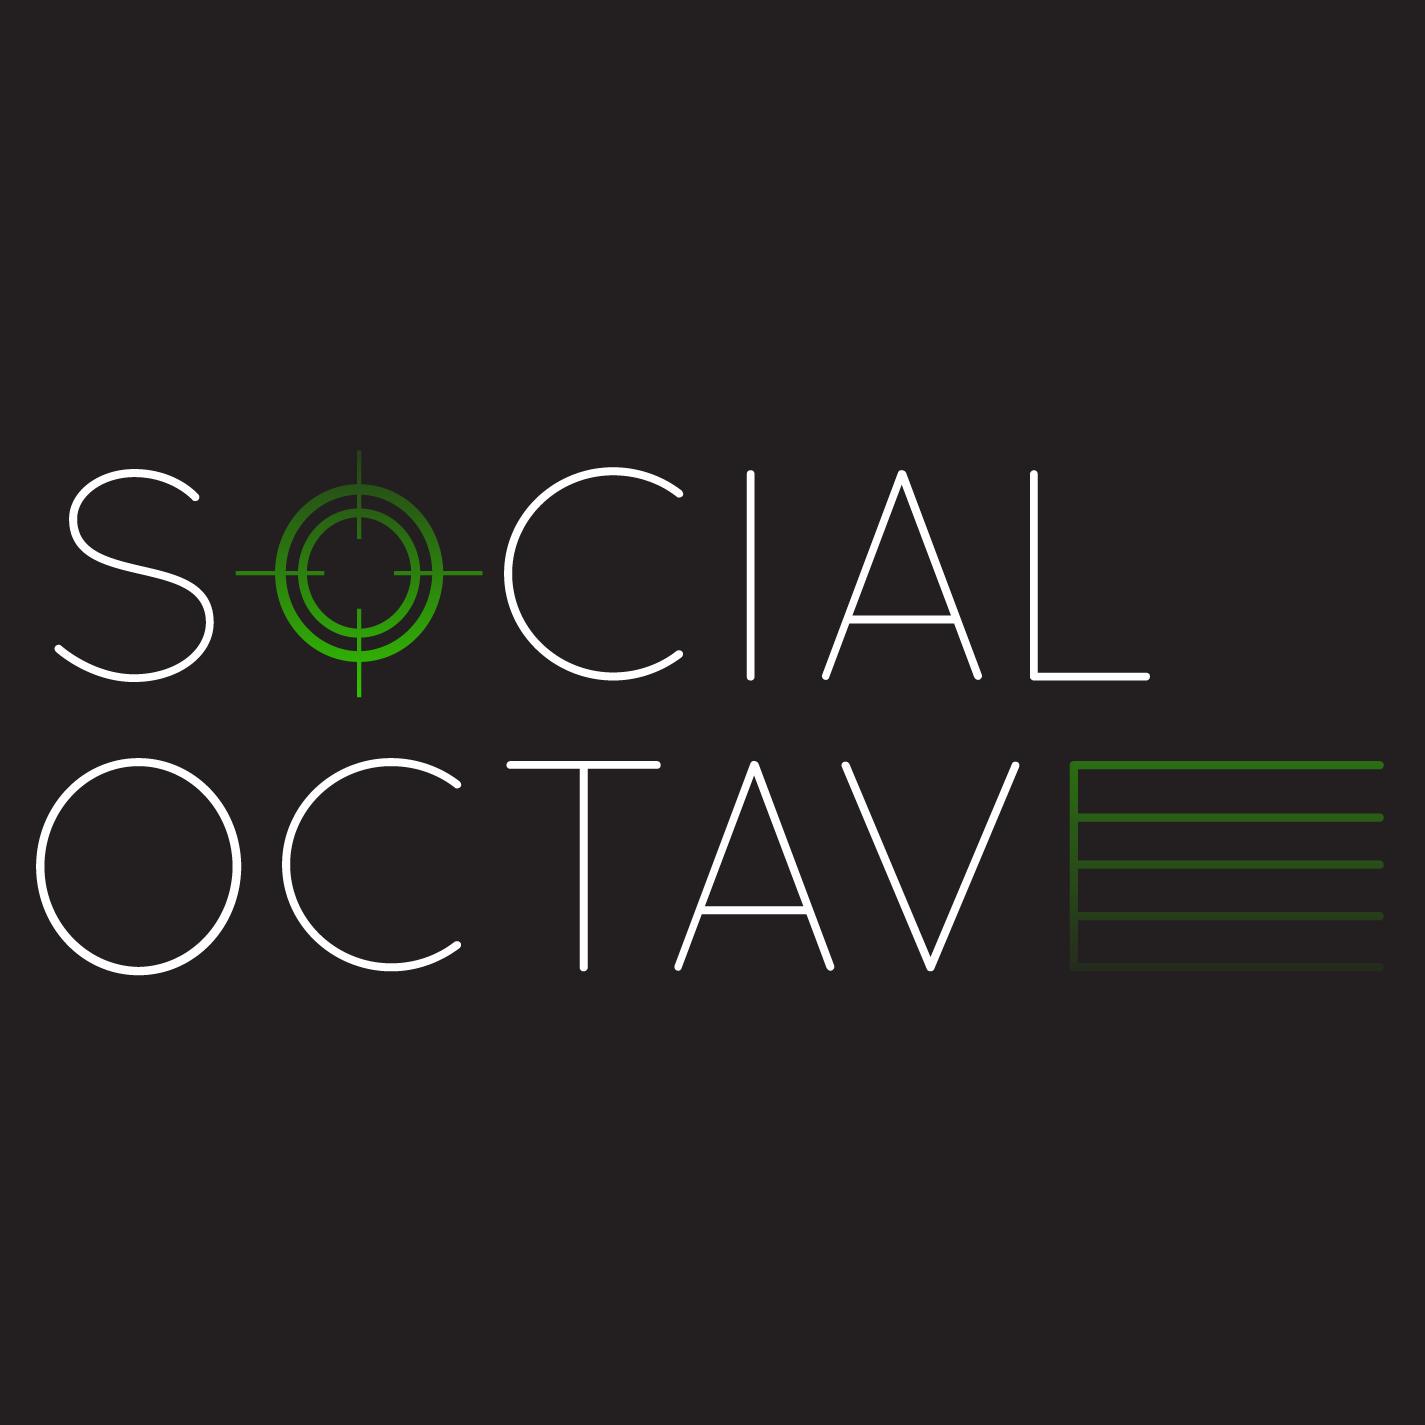 Social Octave